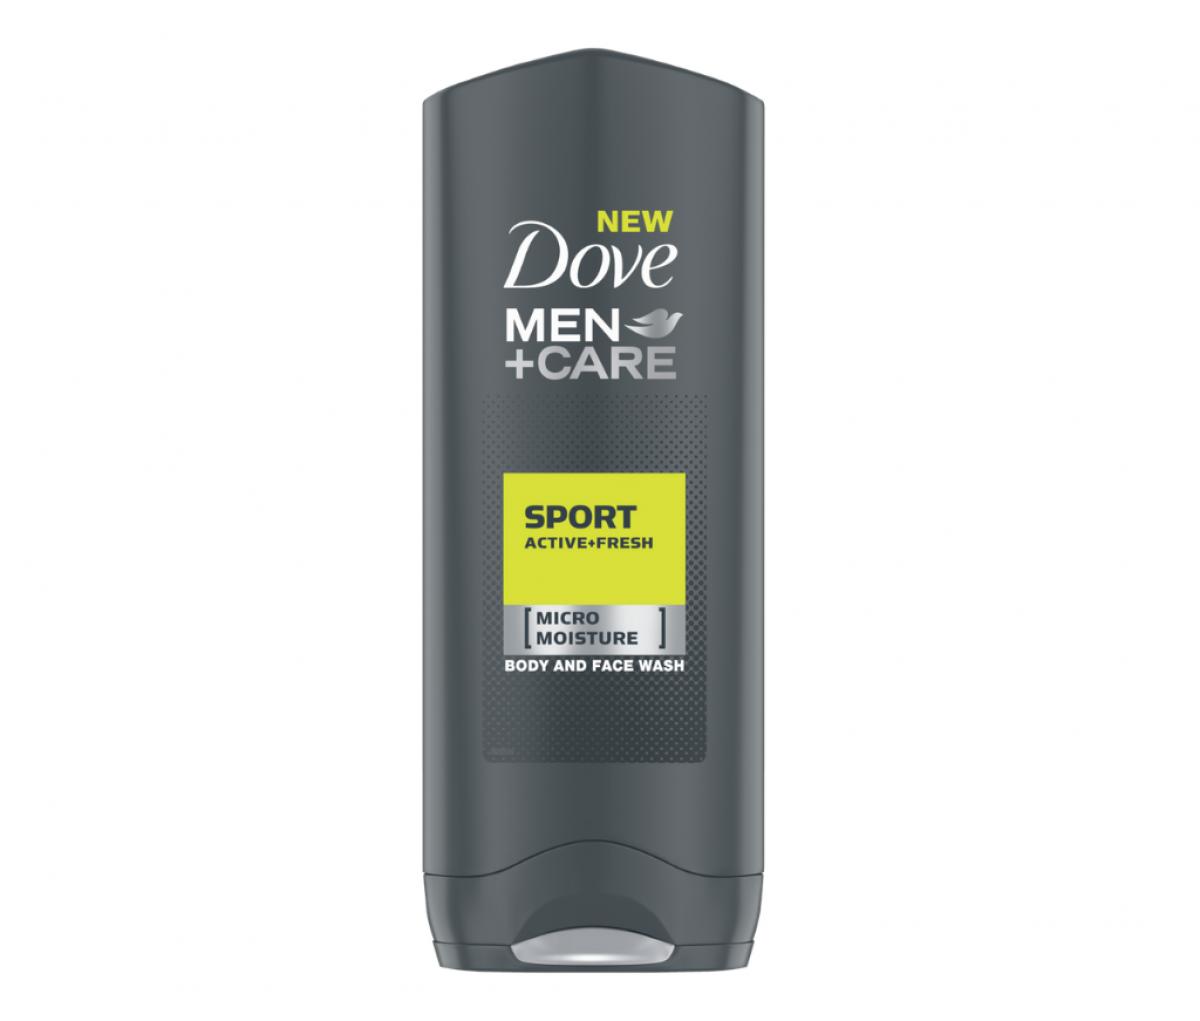 Dove 400ml 2in1 Sport Active+Fresh Body & Face Wash